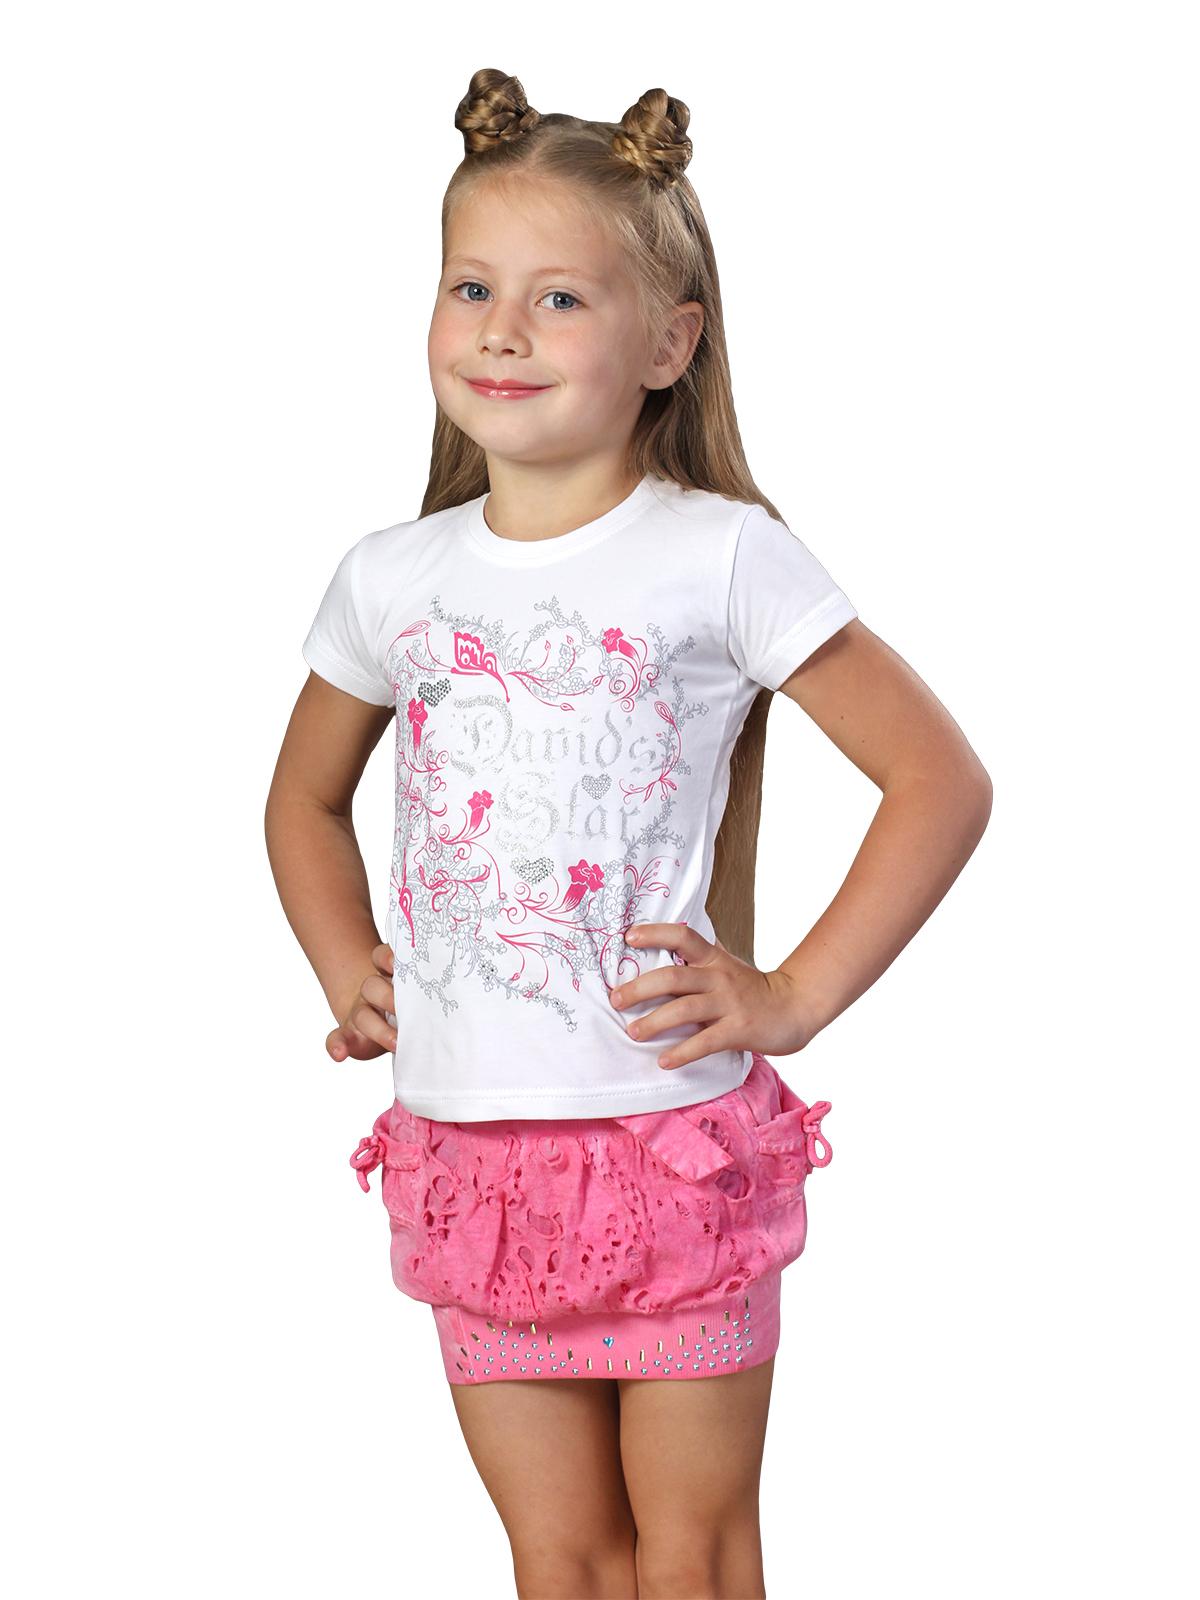 Юбка для девочки, арт.1521 возраст от 4 до 7 лет